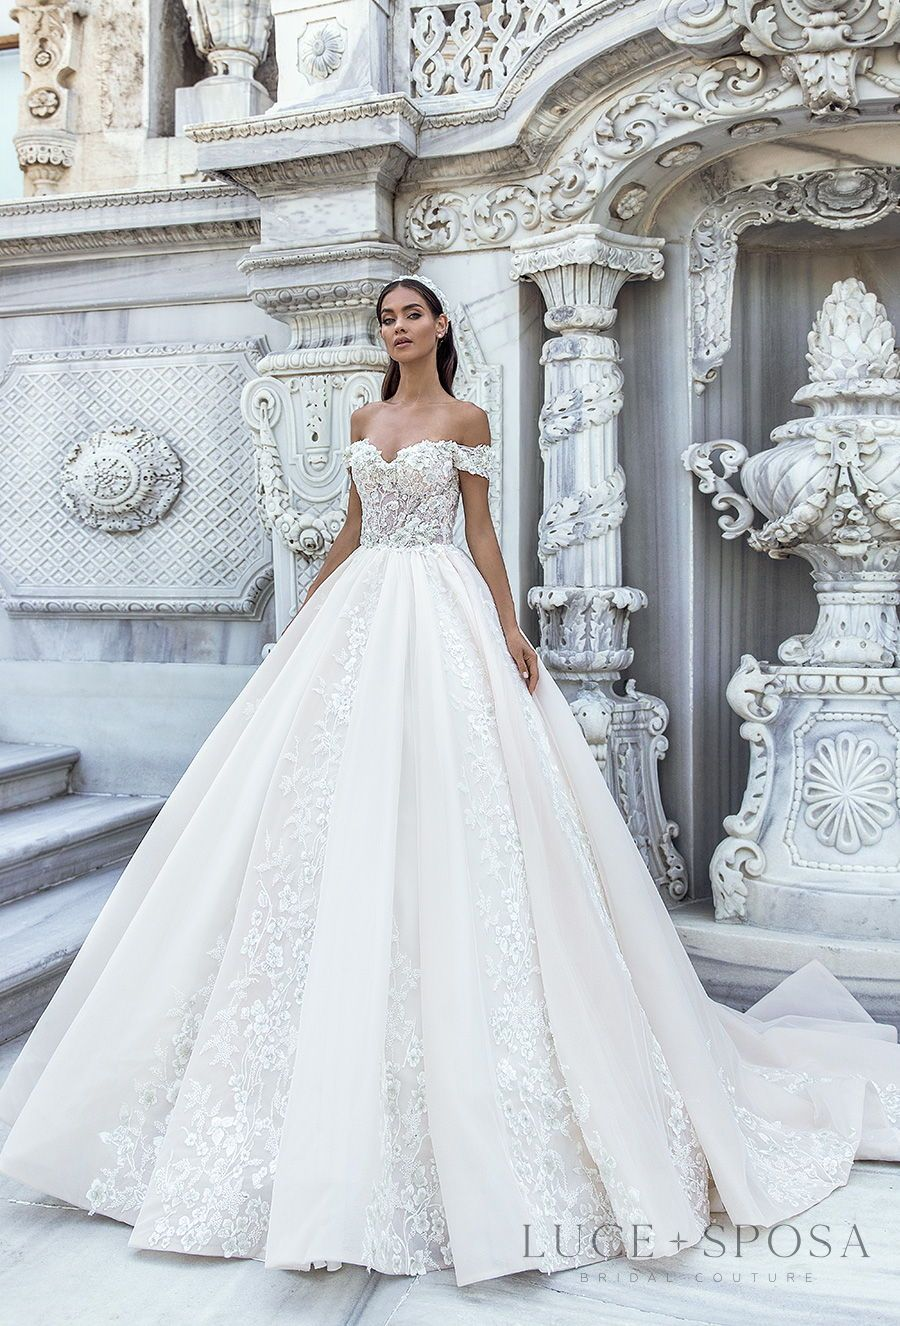 Luce Sposa Spring Summer 2021 Wedding Dresses Istanbul Paris Bridal Collections Wedding Inspirasi Ball Gown Wedding Dress Wedding Dresses Ball Gowns Wedding [ 1326 x 900 Pixel ]